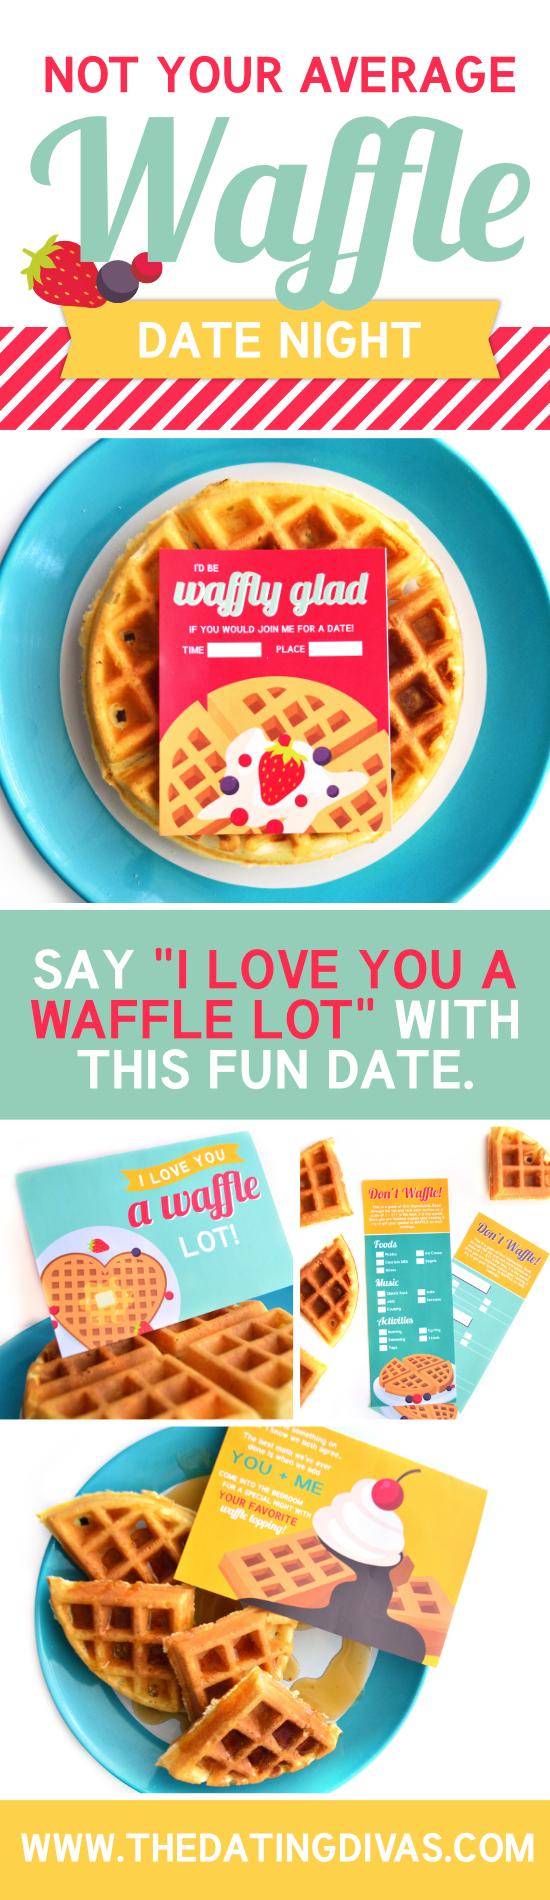 Waffle Love Date Night #WaffleLove #WaffleDate